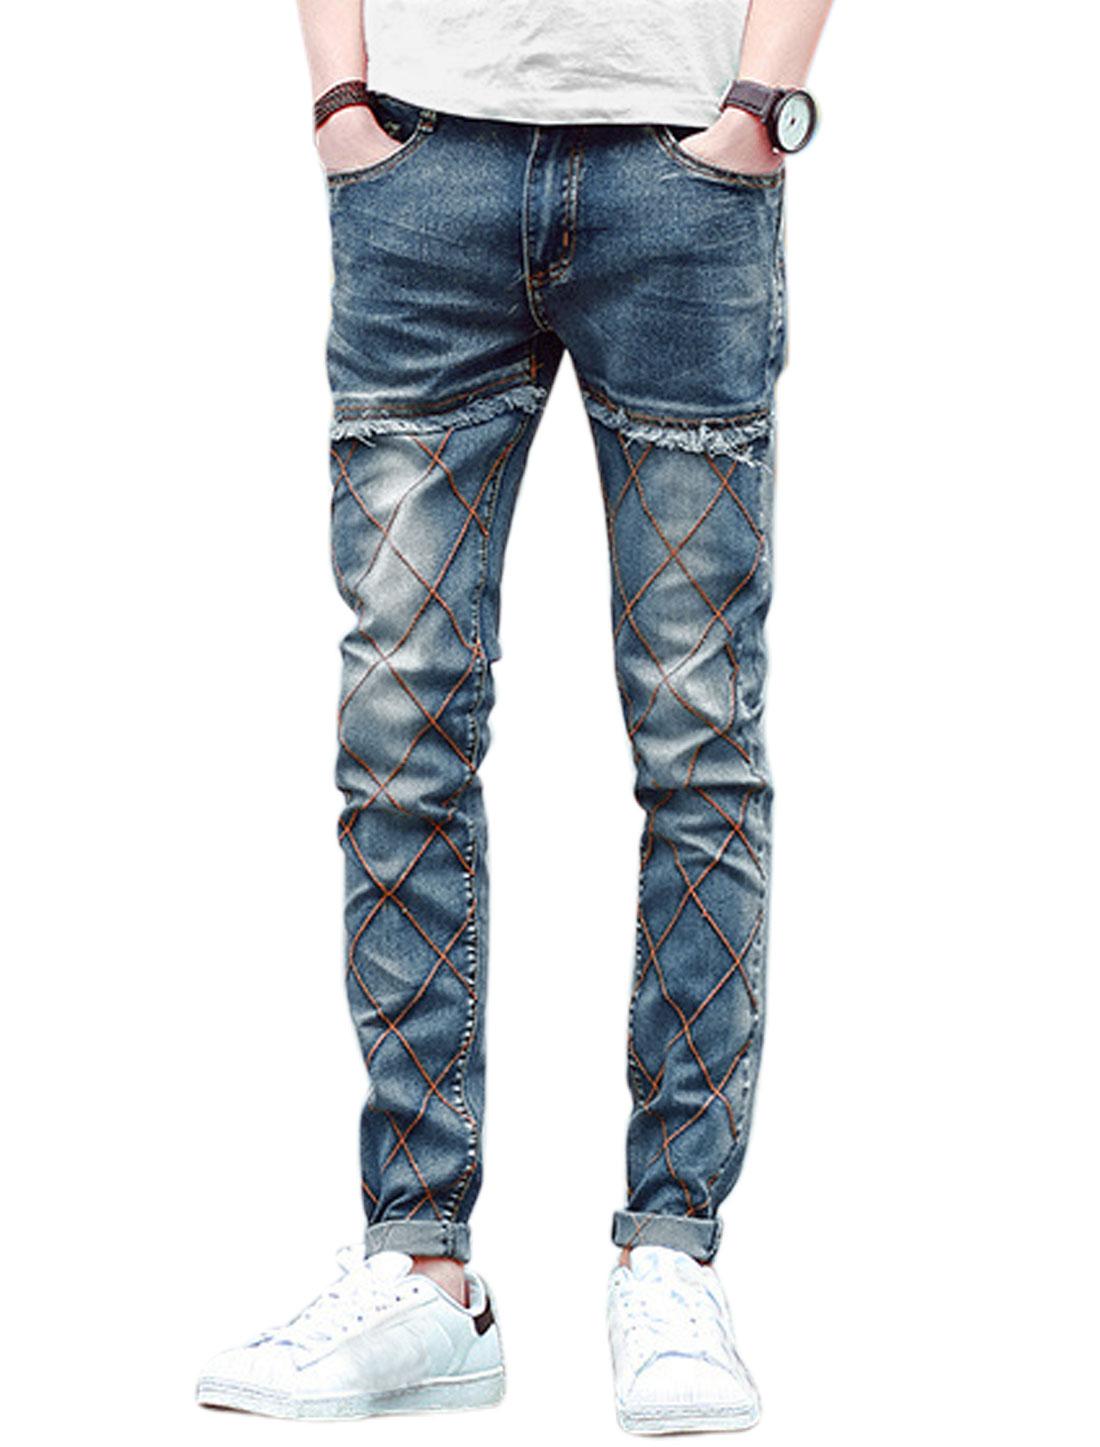 Men Argyle Stitching Tassels Detail Skinny Jeans Drak Blue W28